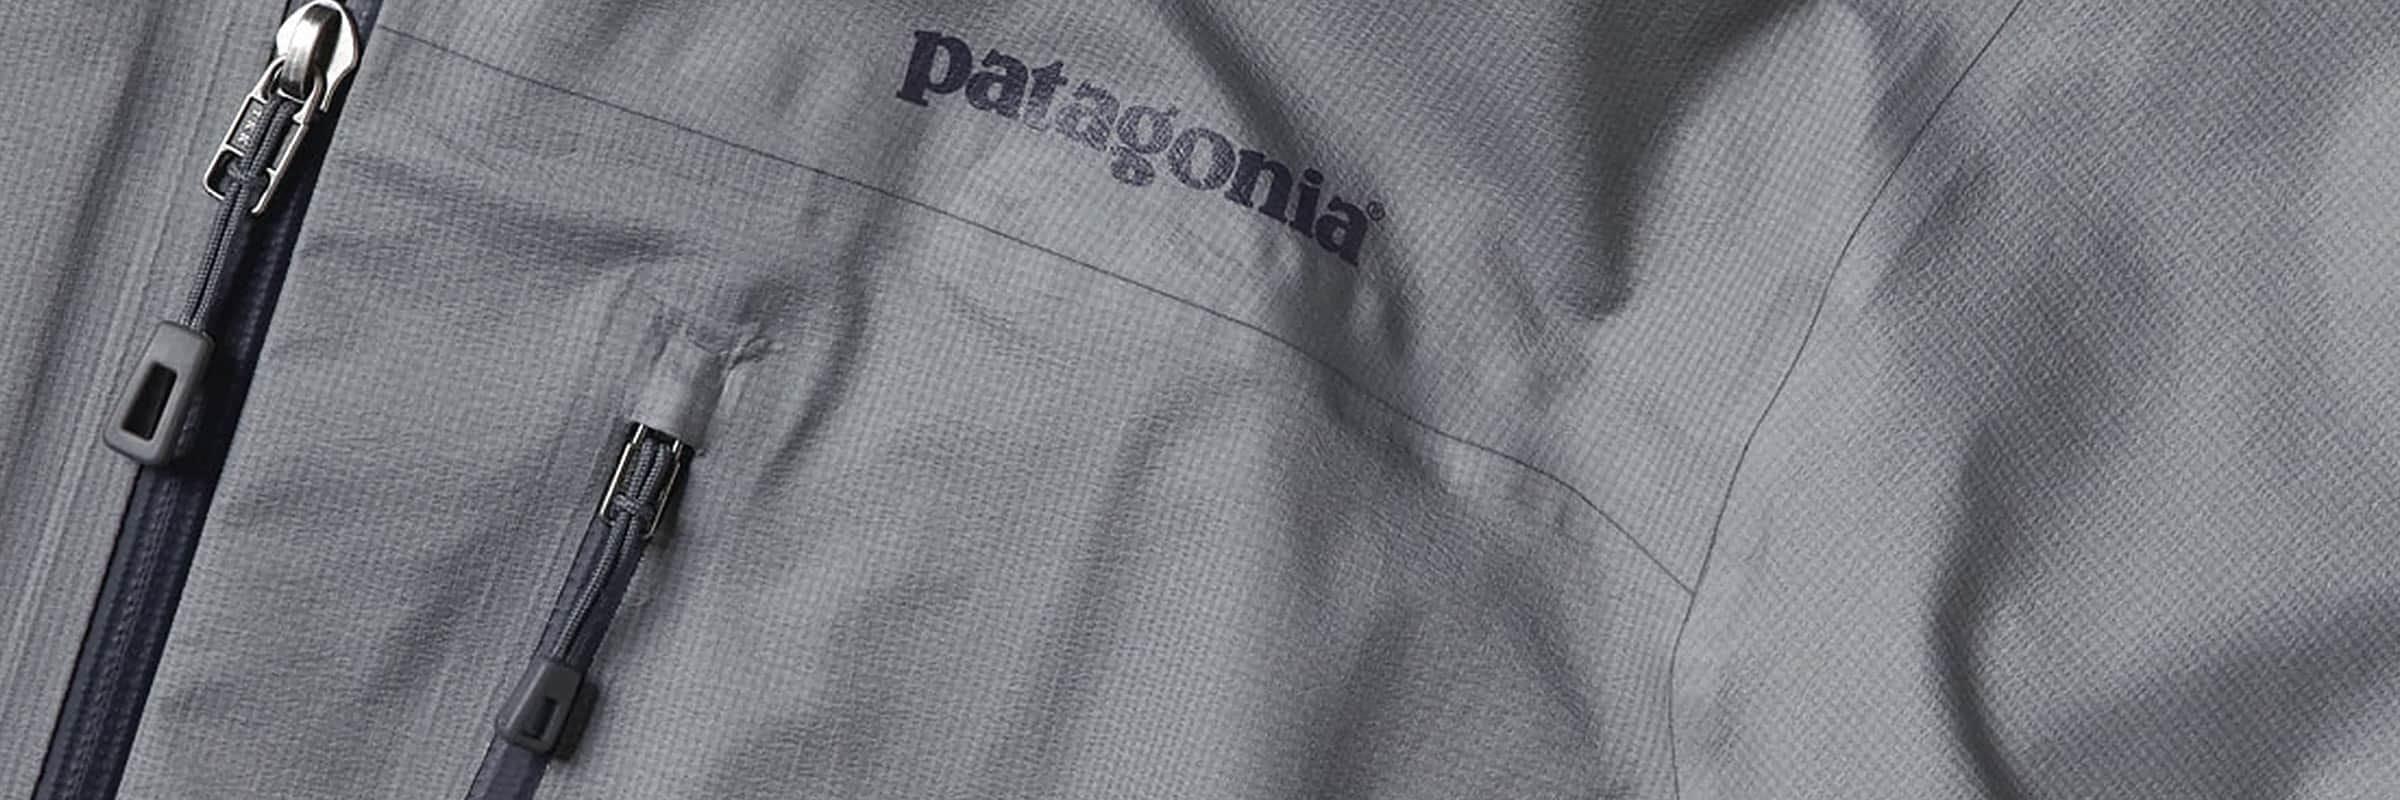 patagonia h2no performance standard